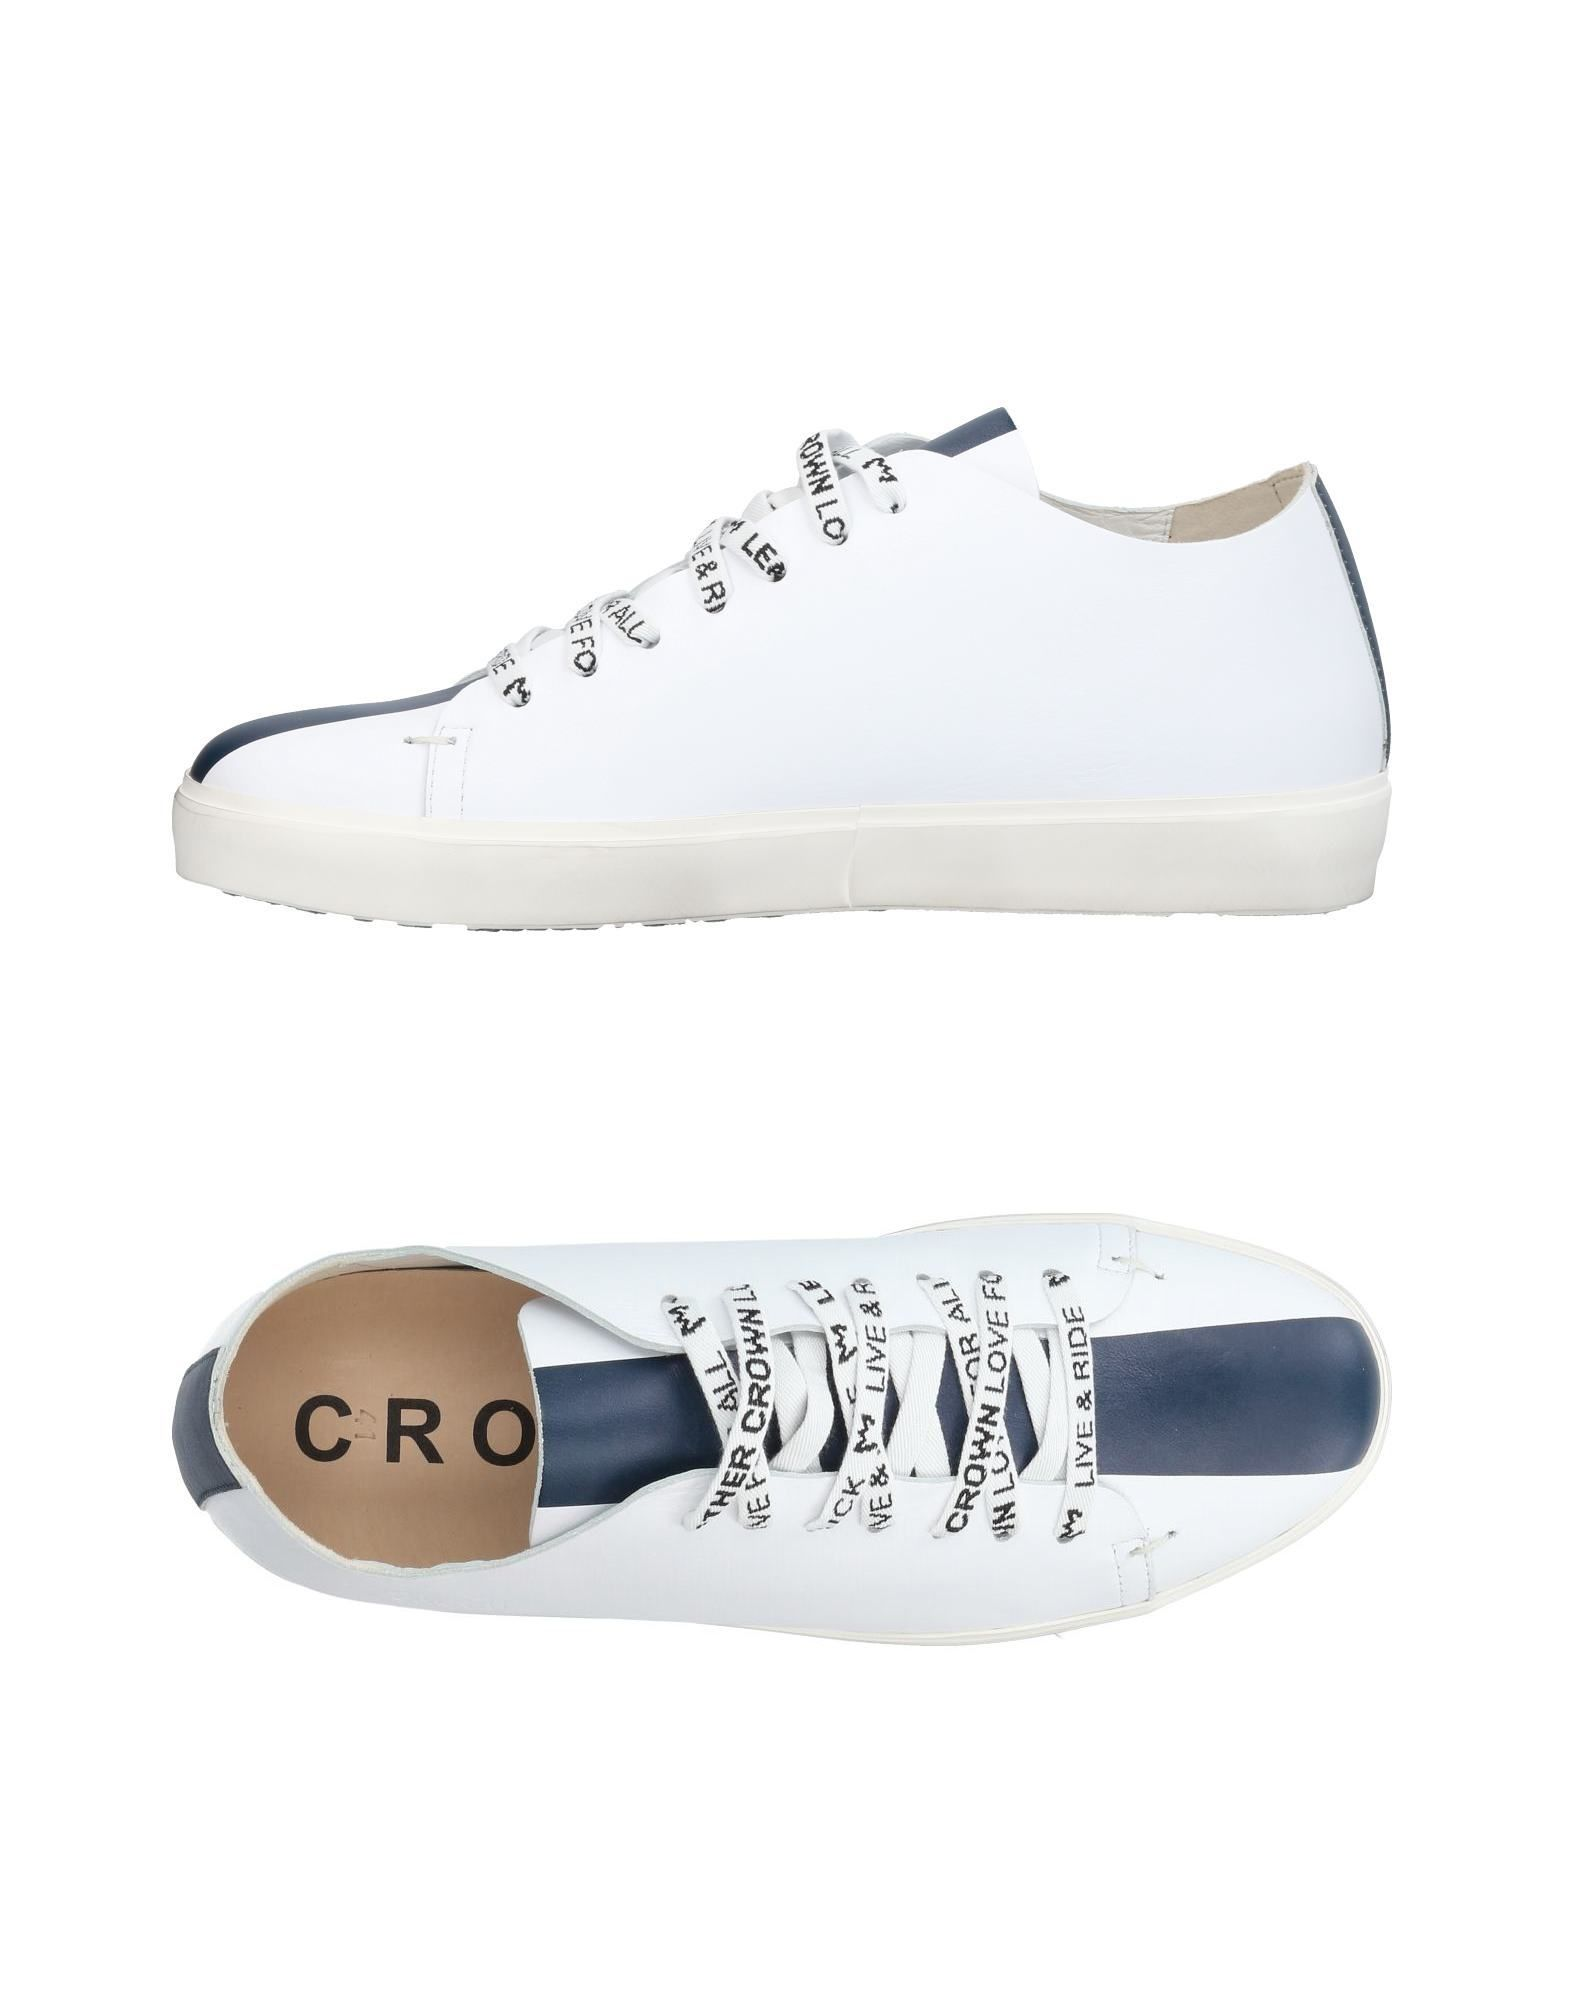 Leather Crown Sneakers Herren  11453691RJ 11453691RJ  Neue Schuhe ffc4a4